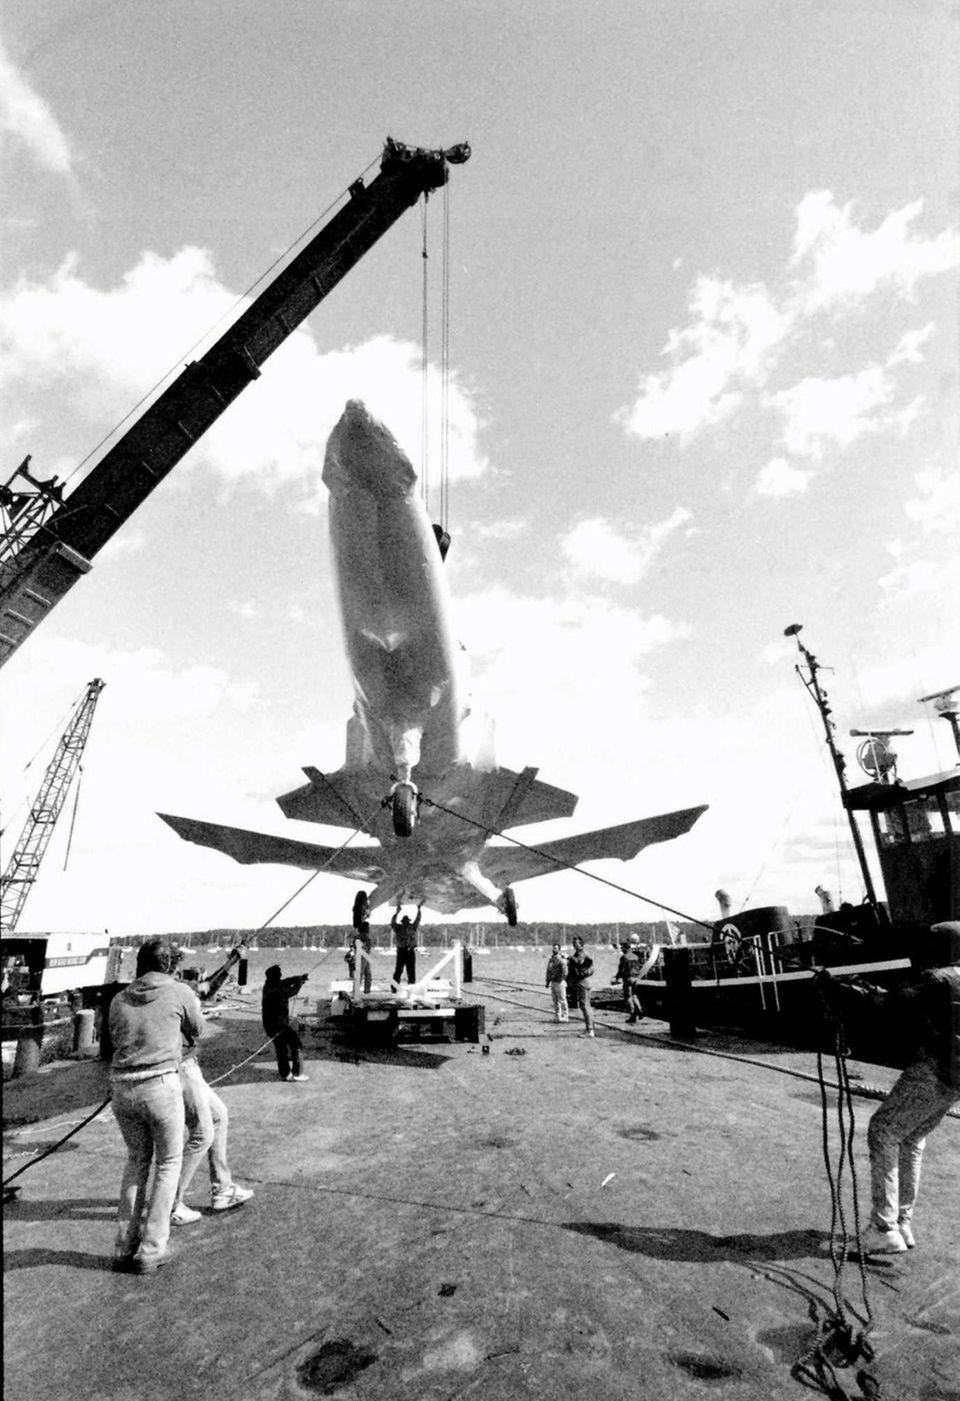 October 11, 1988: Grumman Corp. ships the second